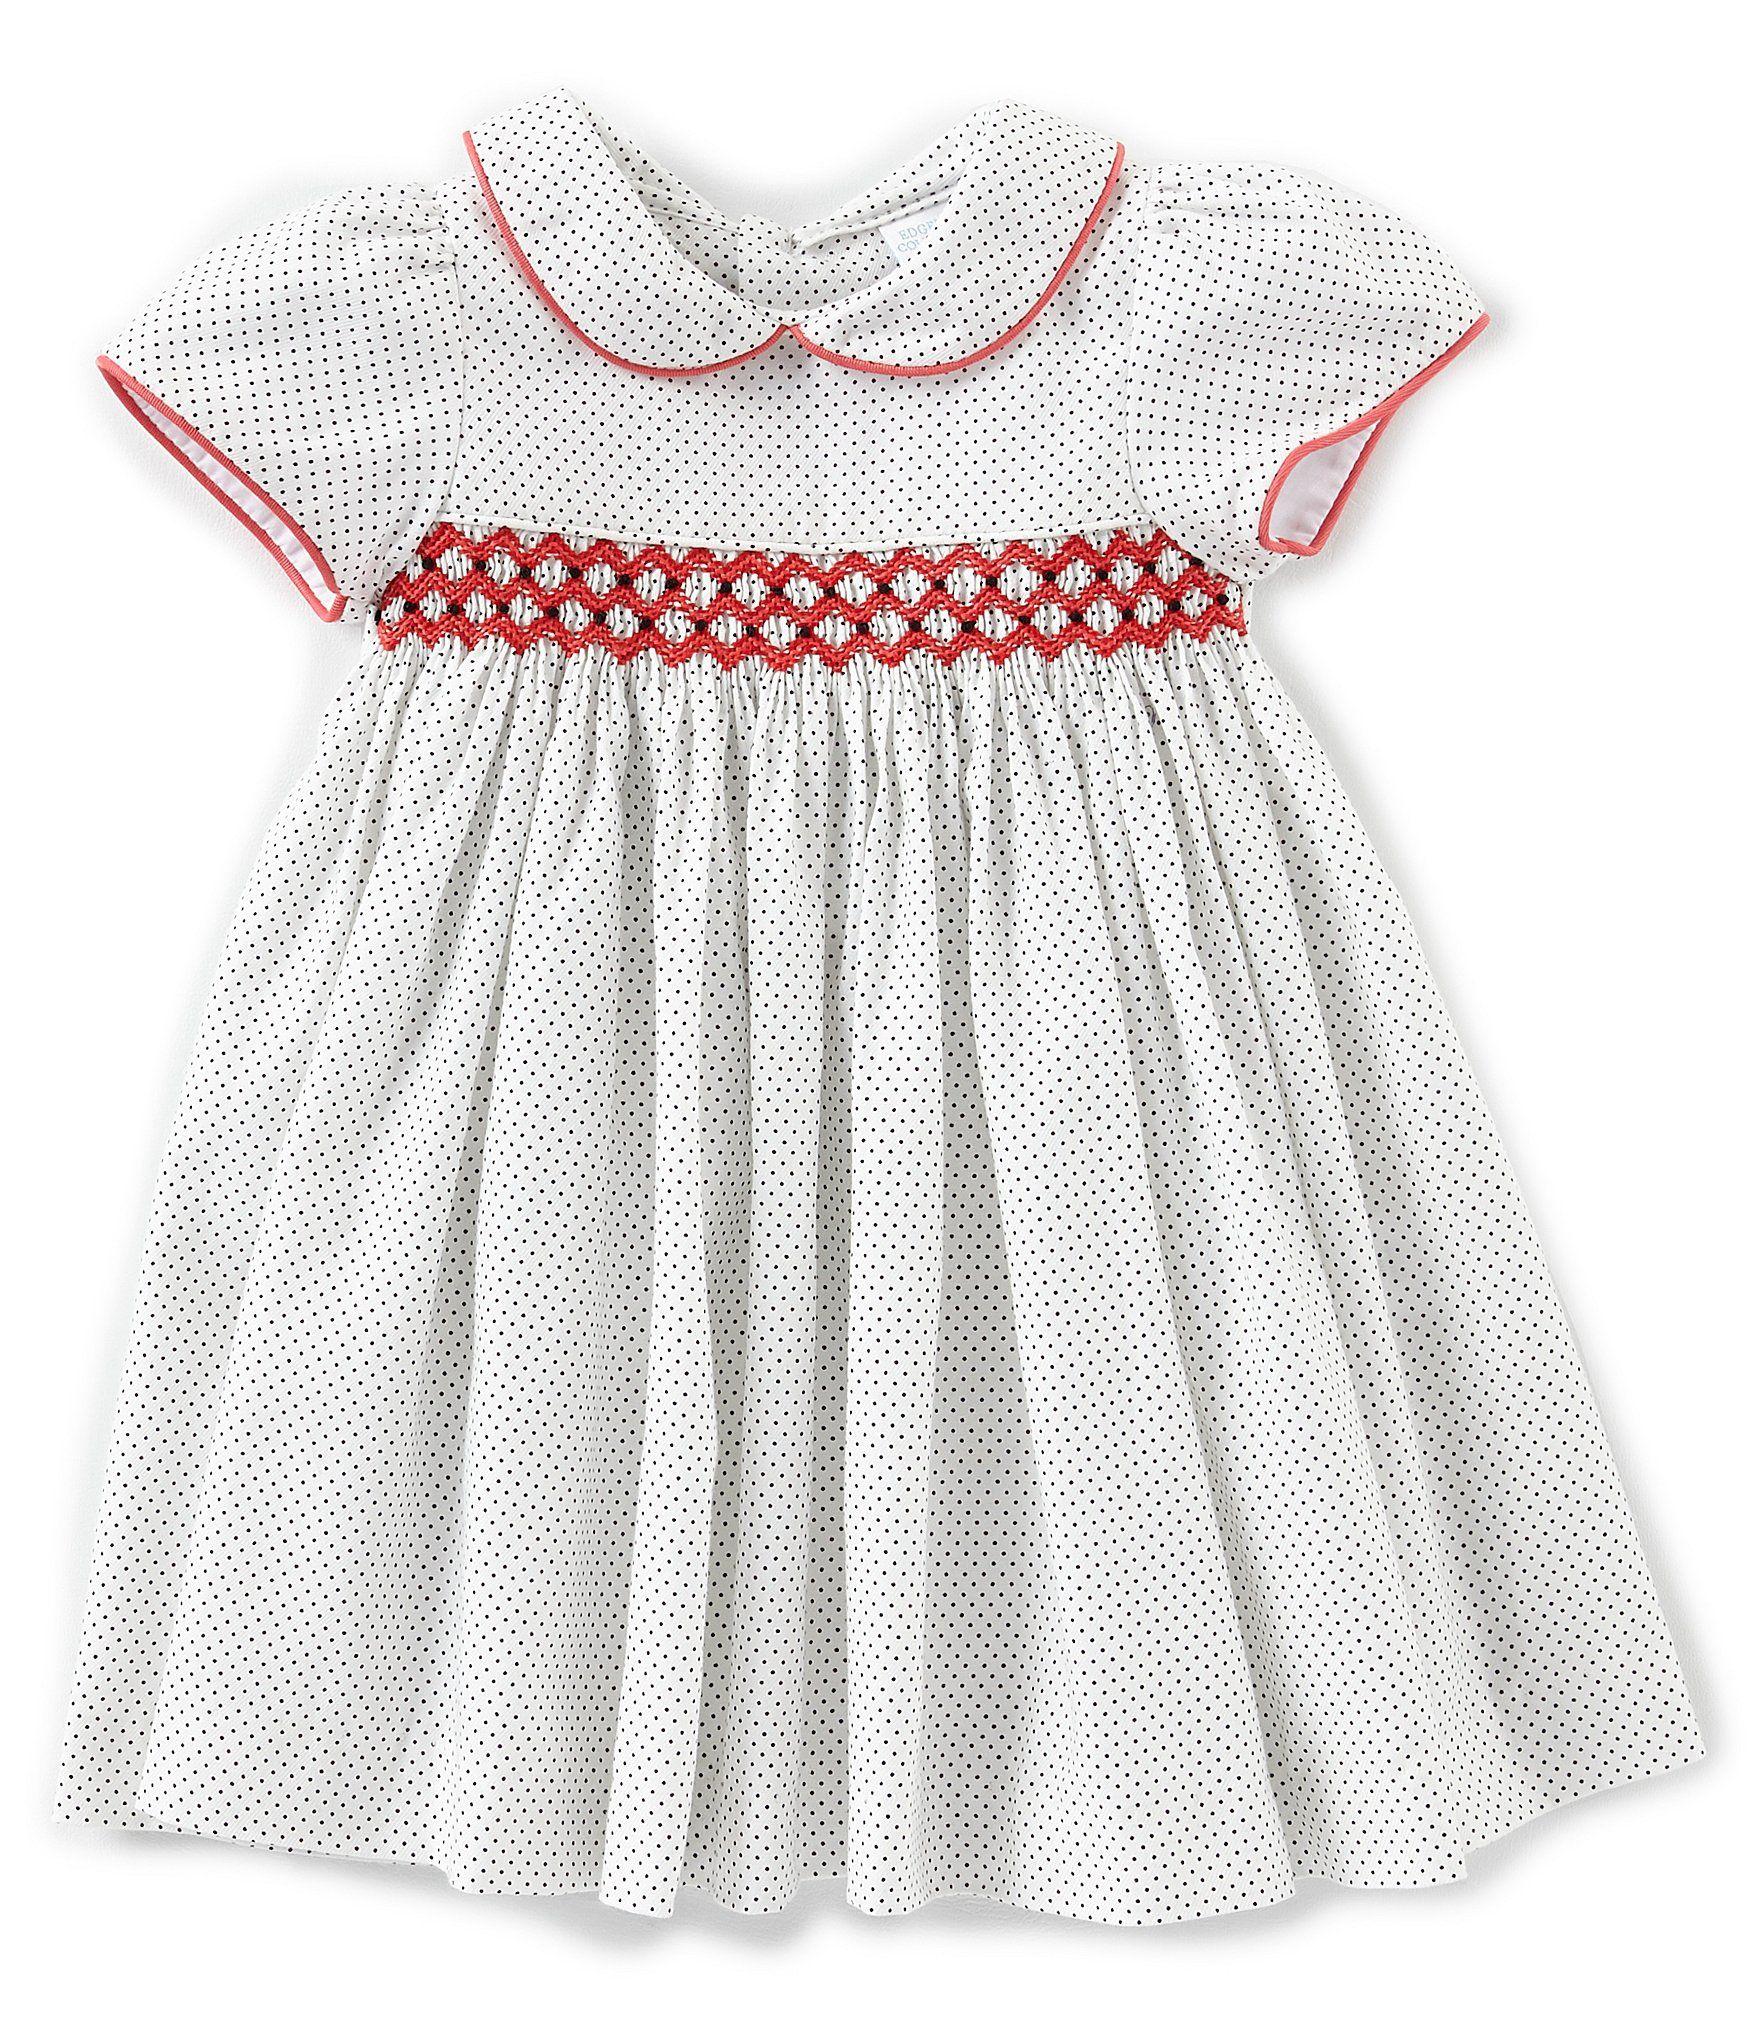 21965dd2b25 Shop for Edgehill Collection Baby Girls 3-24 Months Dot Geometric Print  Smocked Short Sleeve. Visit